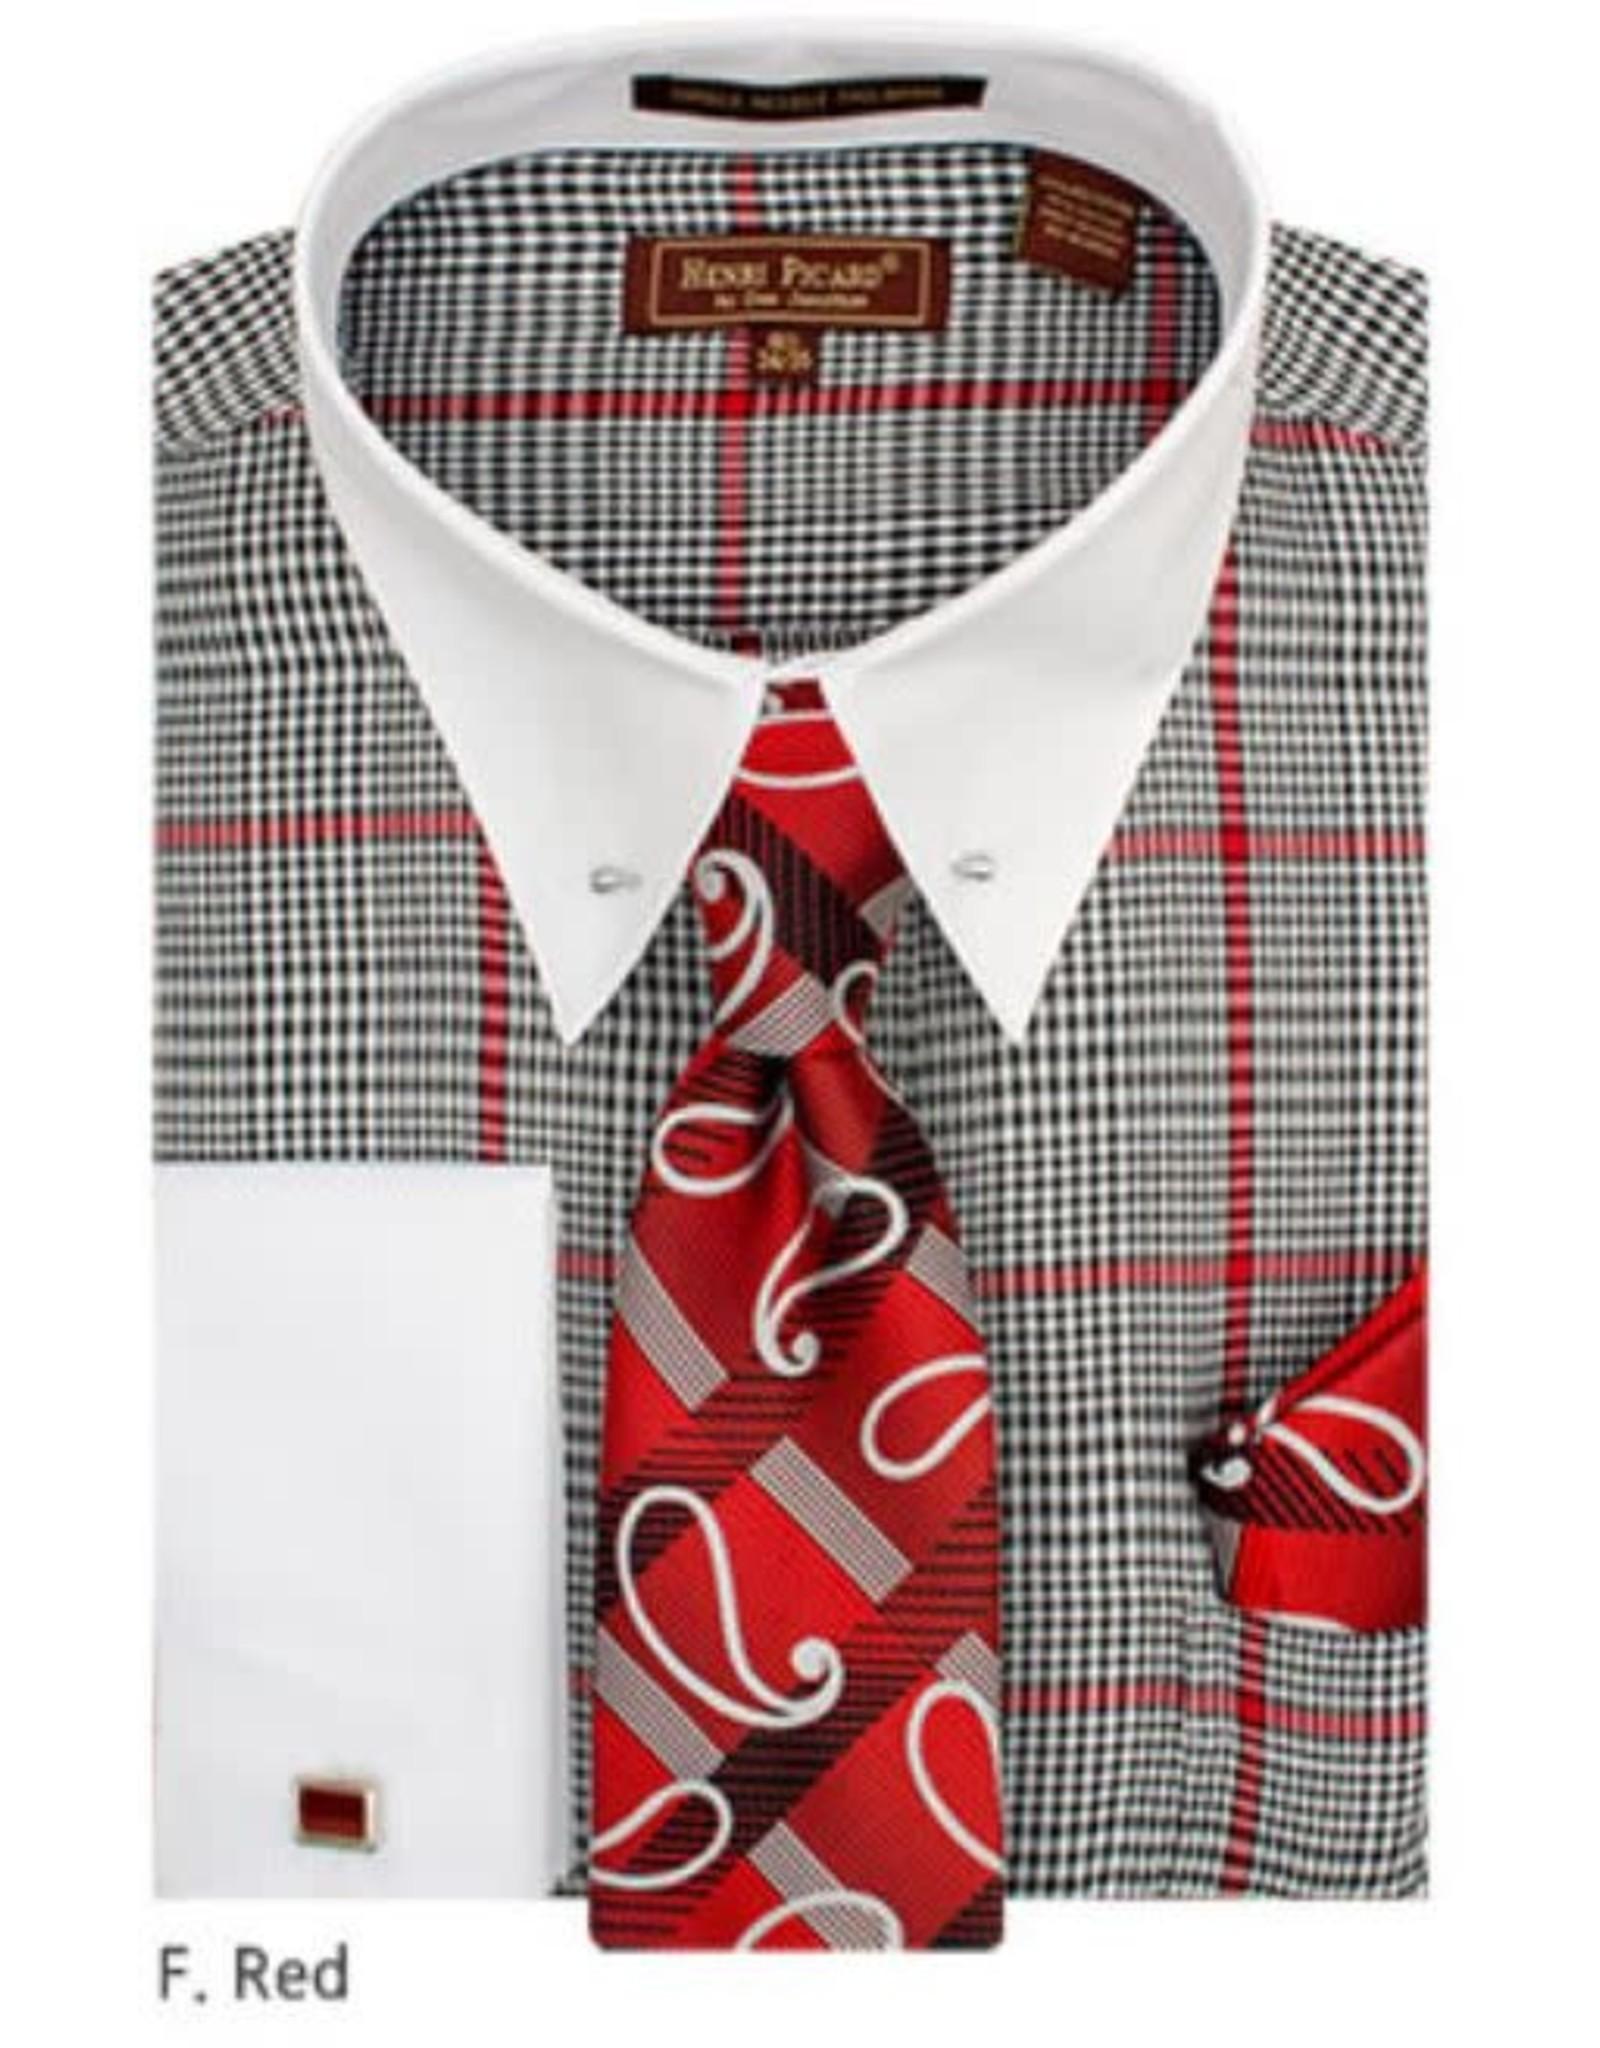 Henri Picard Henri Picard Shirt Set FC173 Red